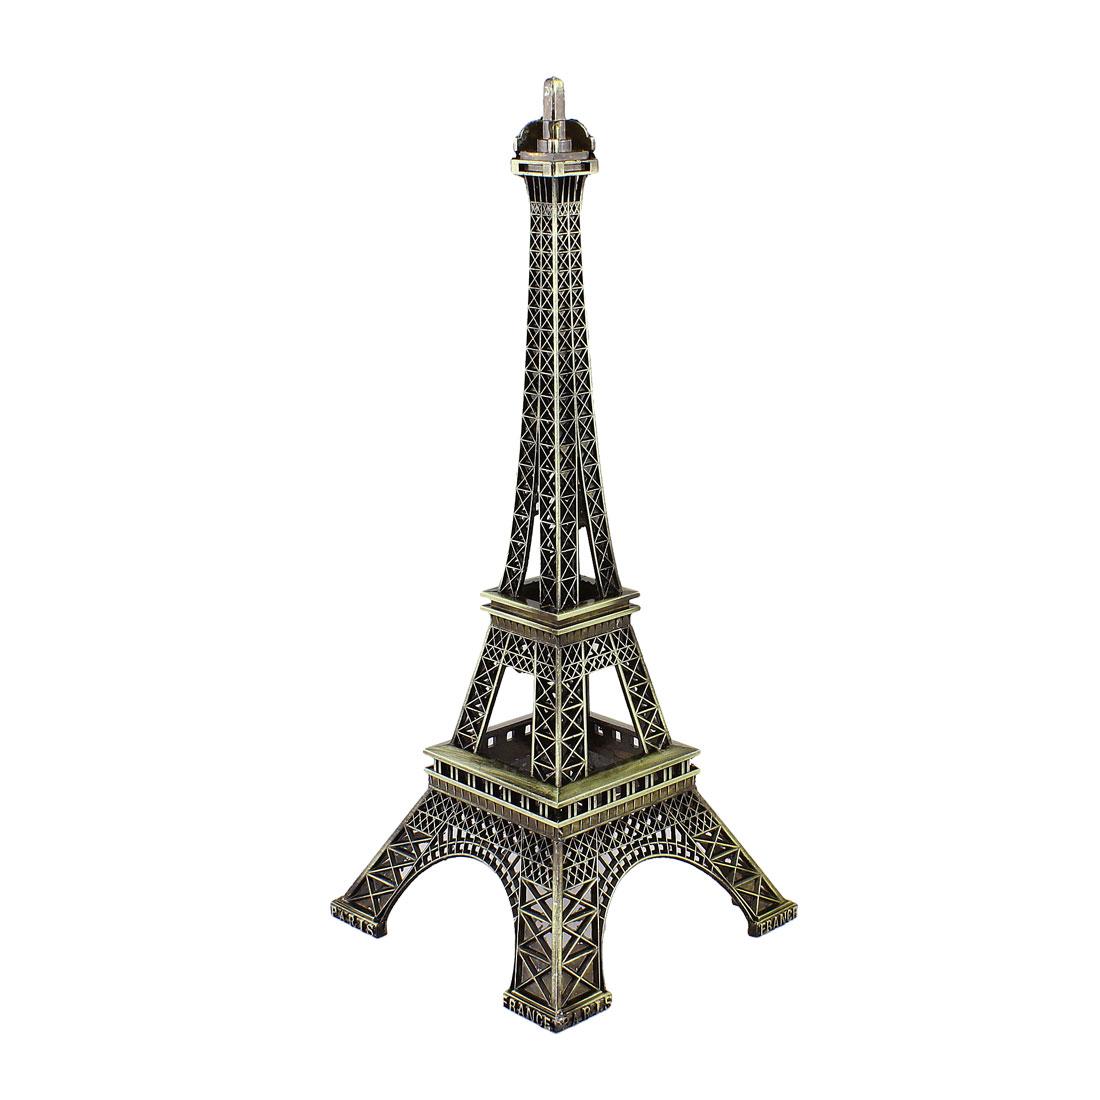 "Metal France Miniature Eiffel Tower Statue Model Ornament 10"" Bronze Tone"